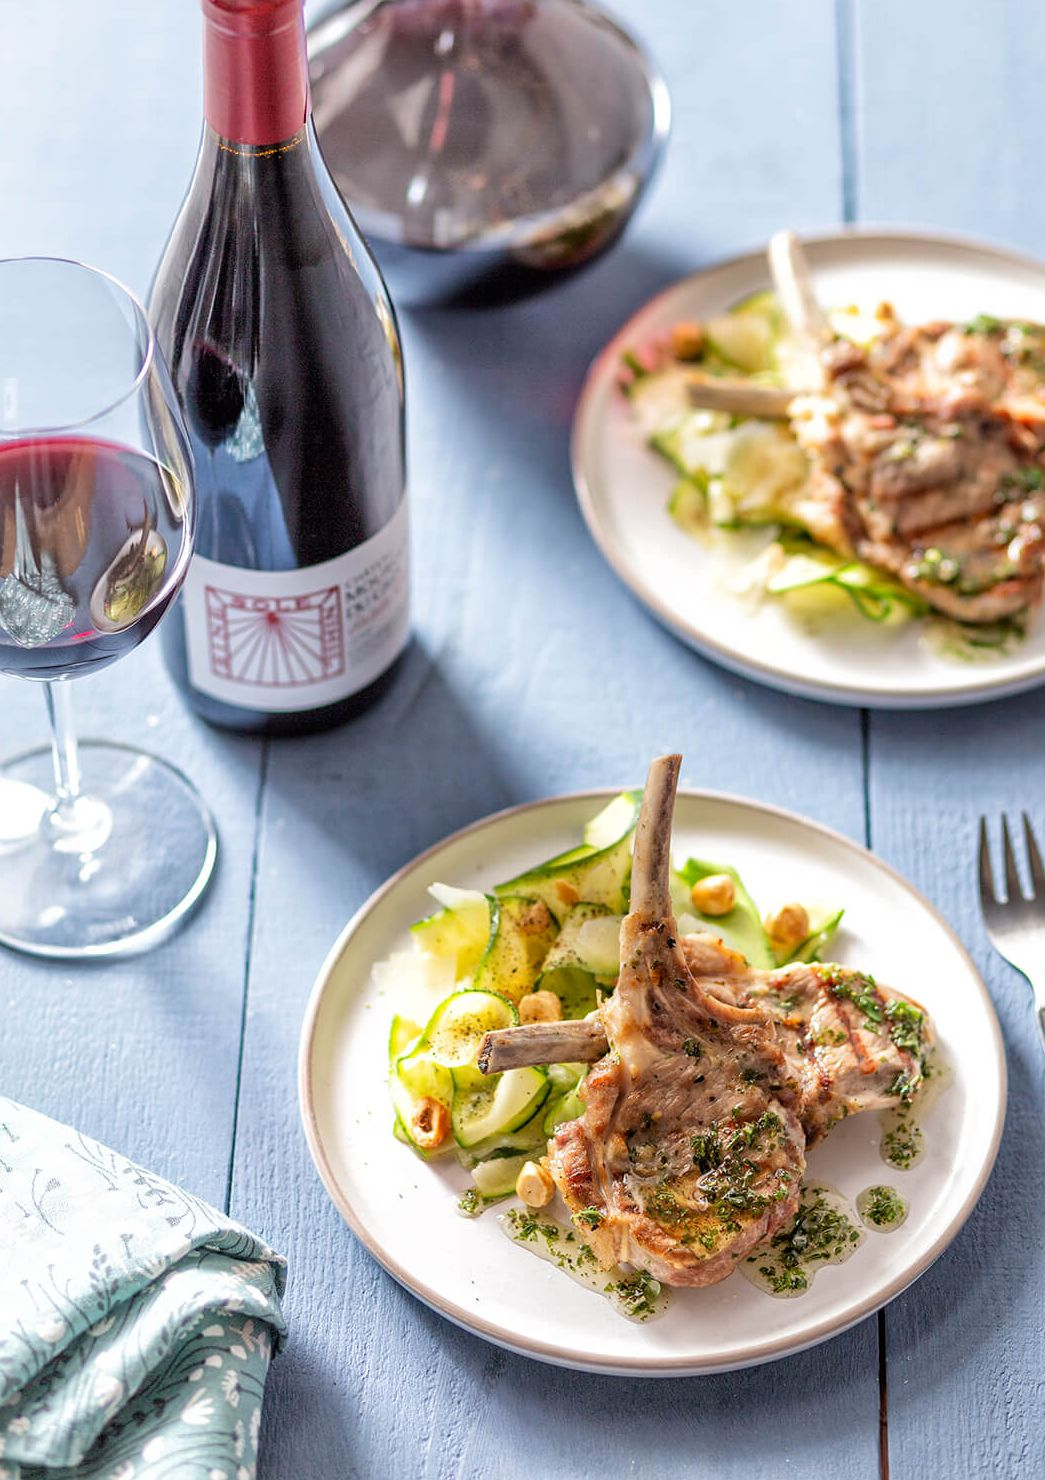 Provençaalse lamskoteletten met courgettesalade